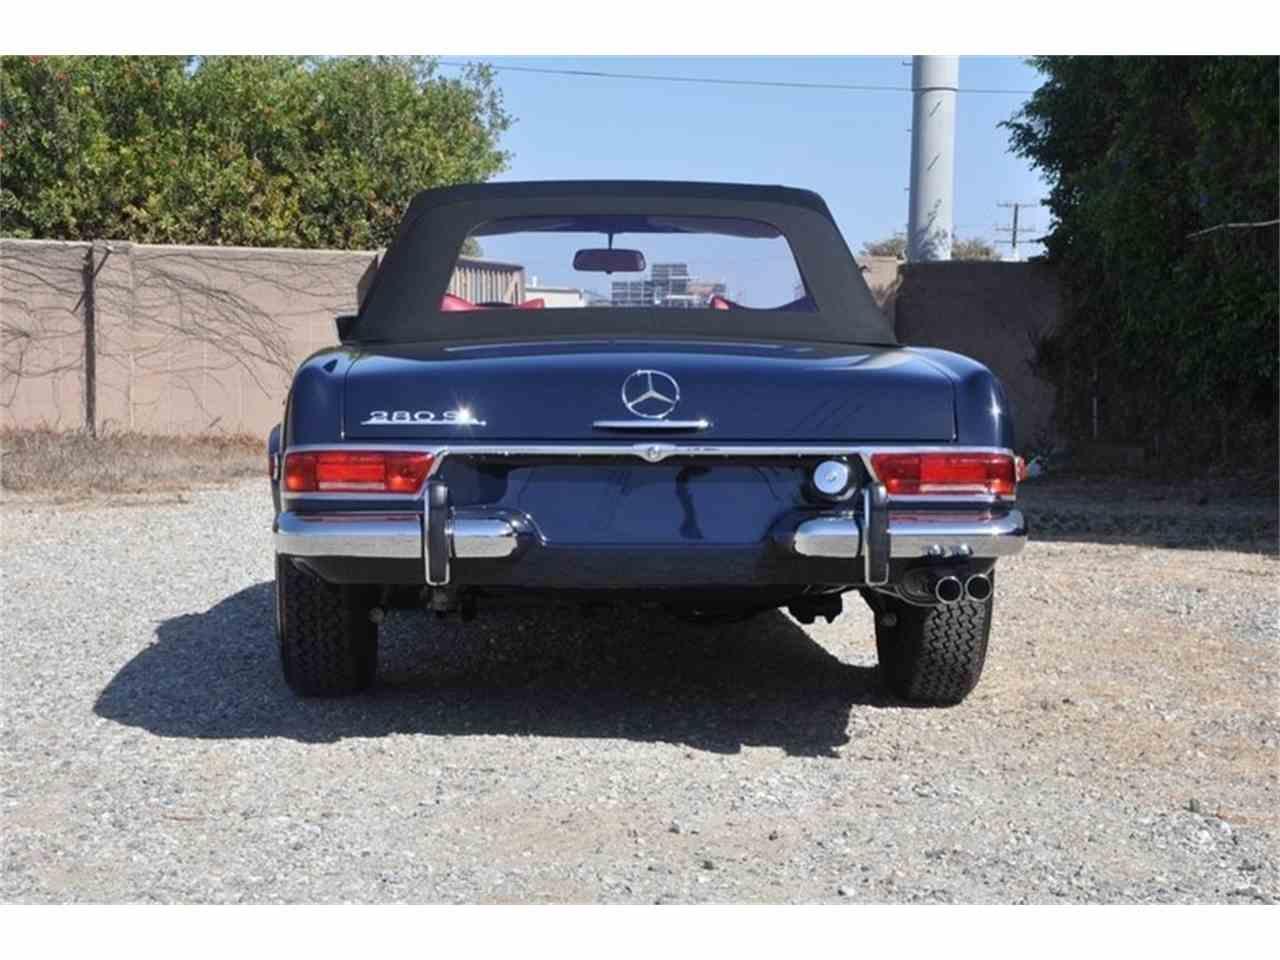 Large Picture of Classic 1969 Mercedes-Benz 280SL located in Costa Mesa California - JFPJ